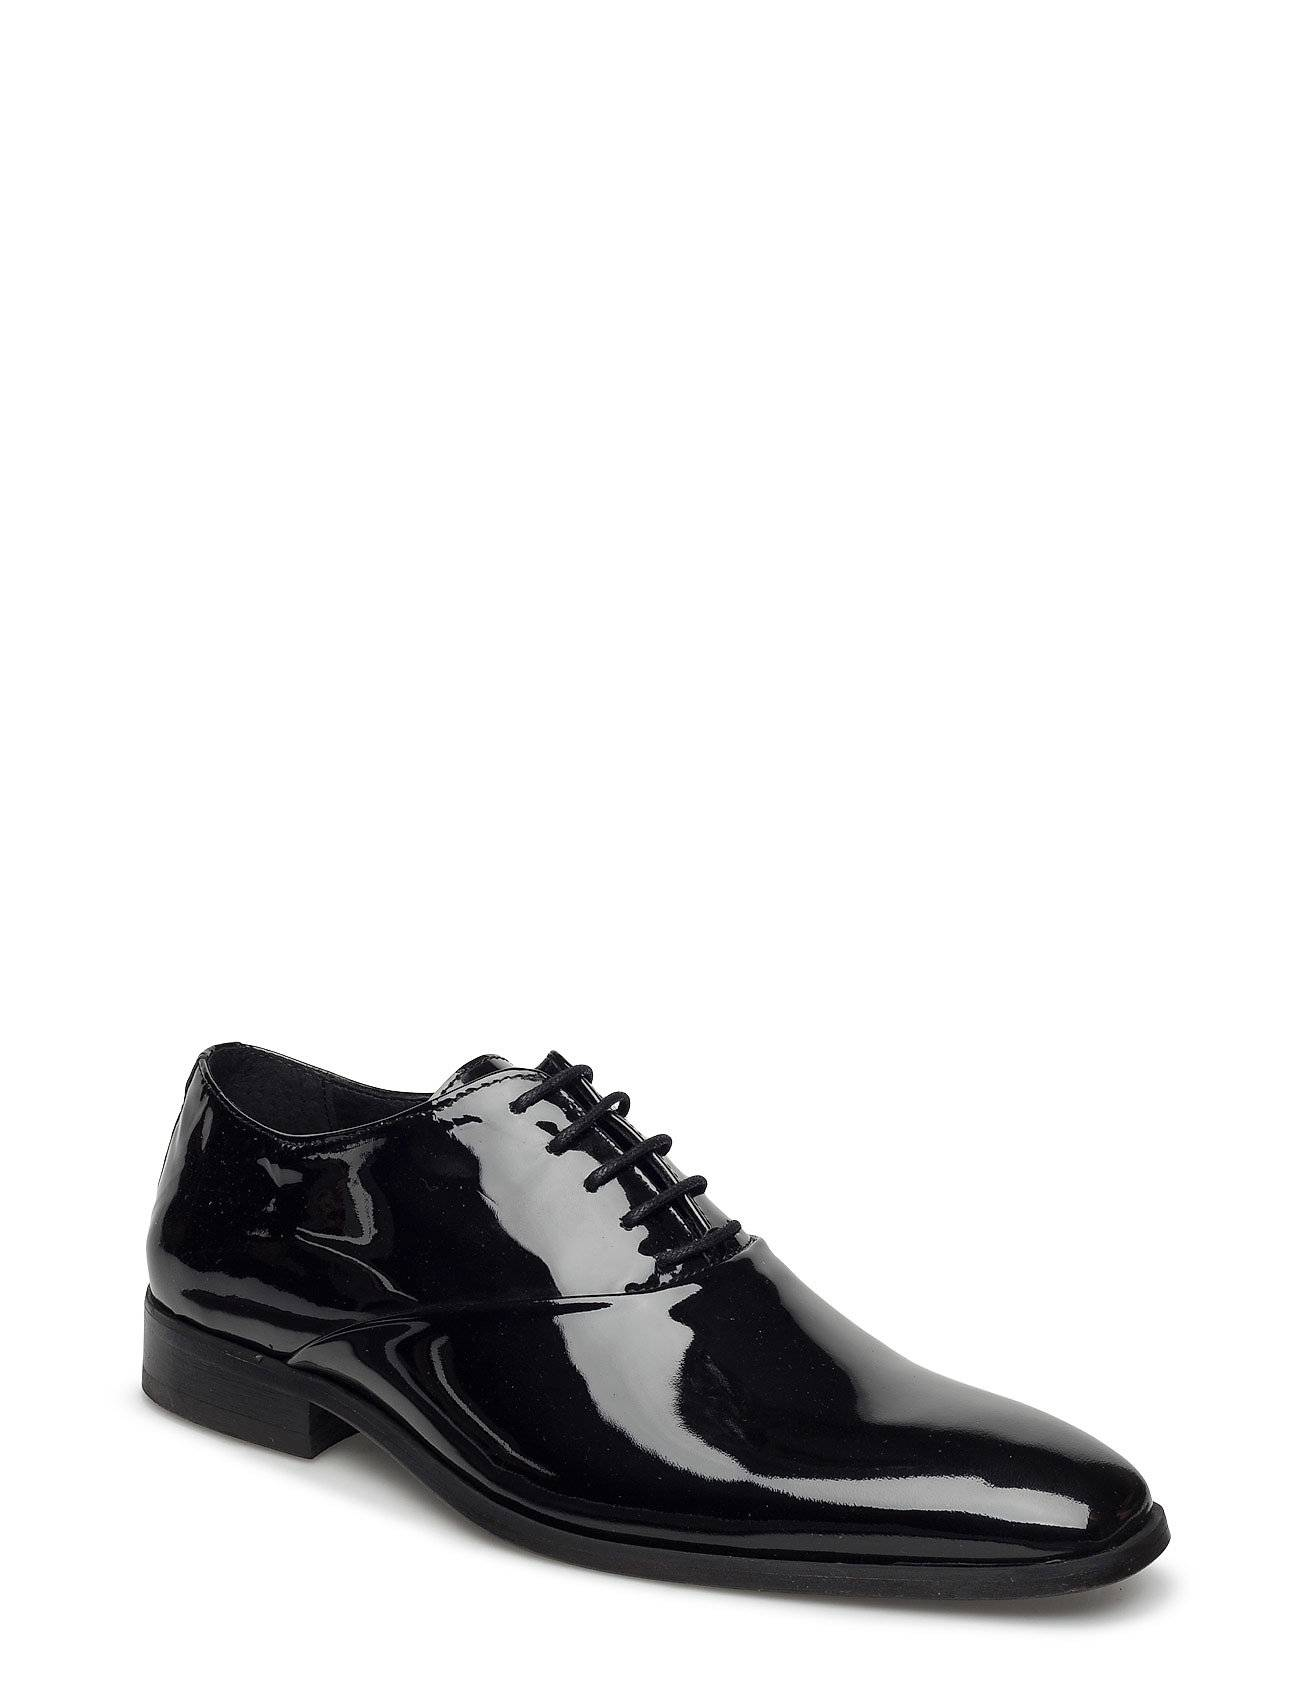 Playboy Footwear Patent Shoe Shoes Business Formal Shoes Musta Playboy Footwear